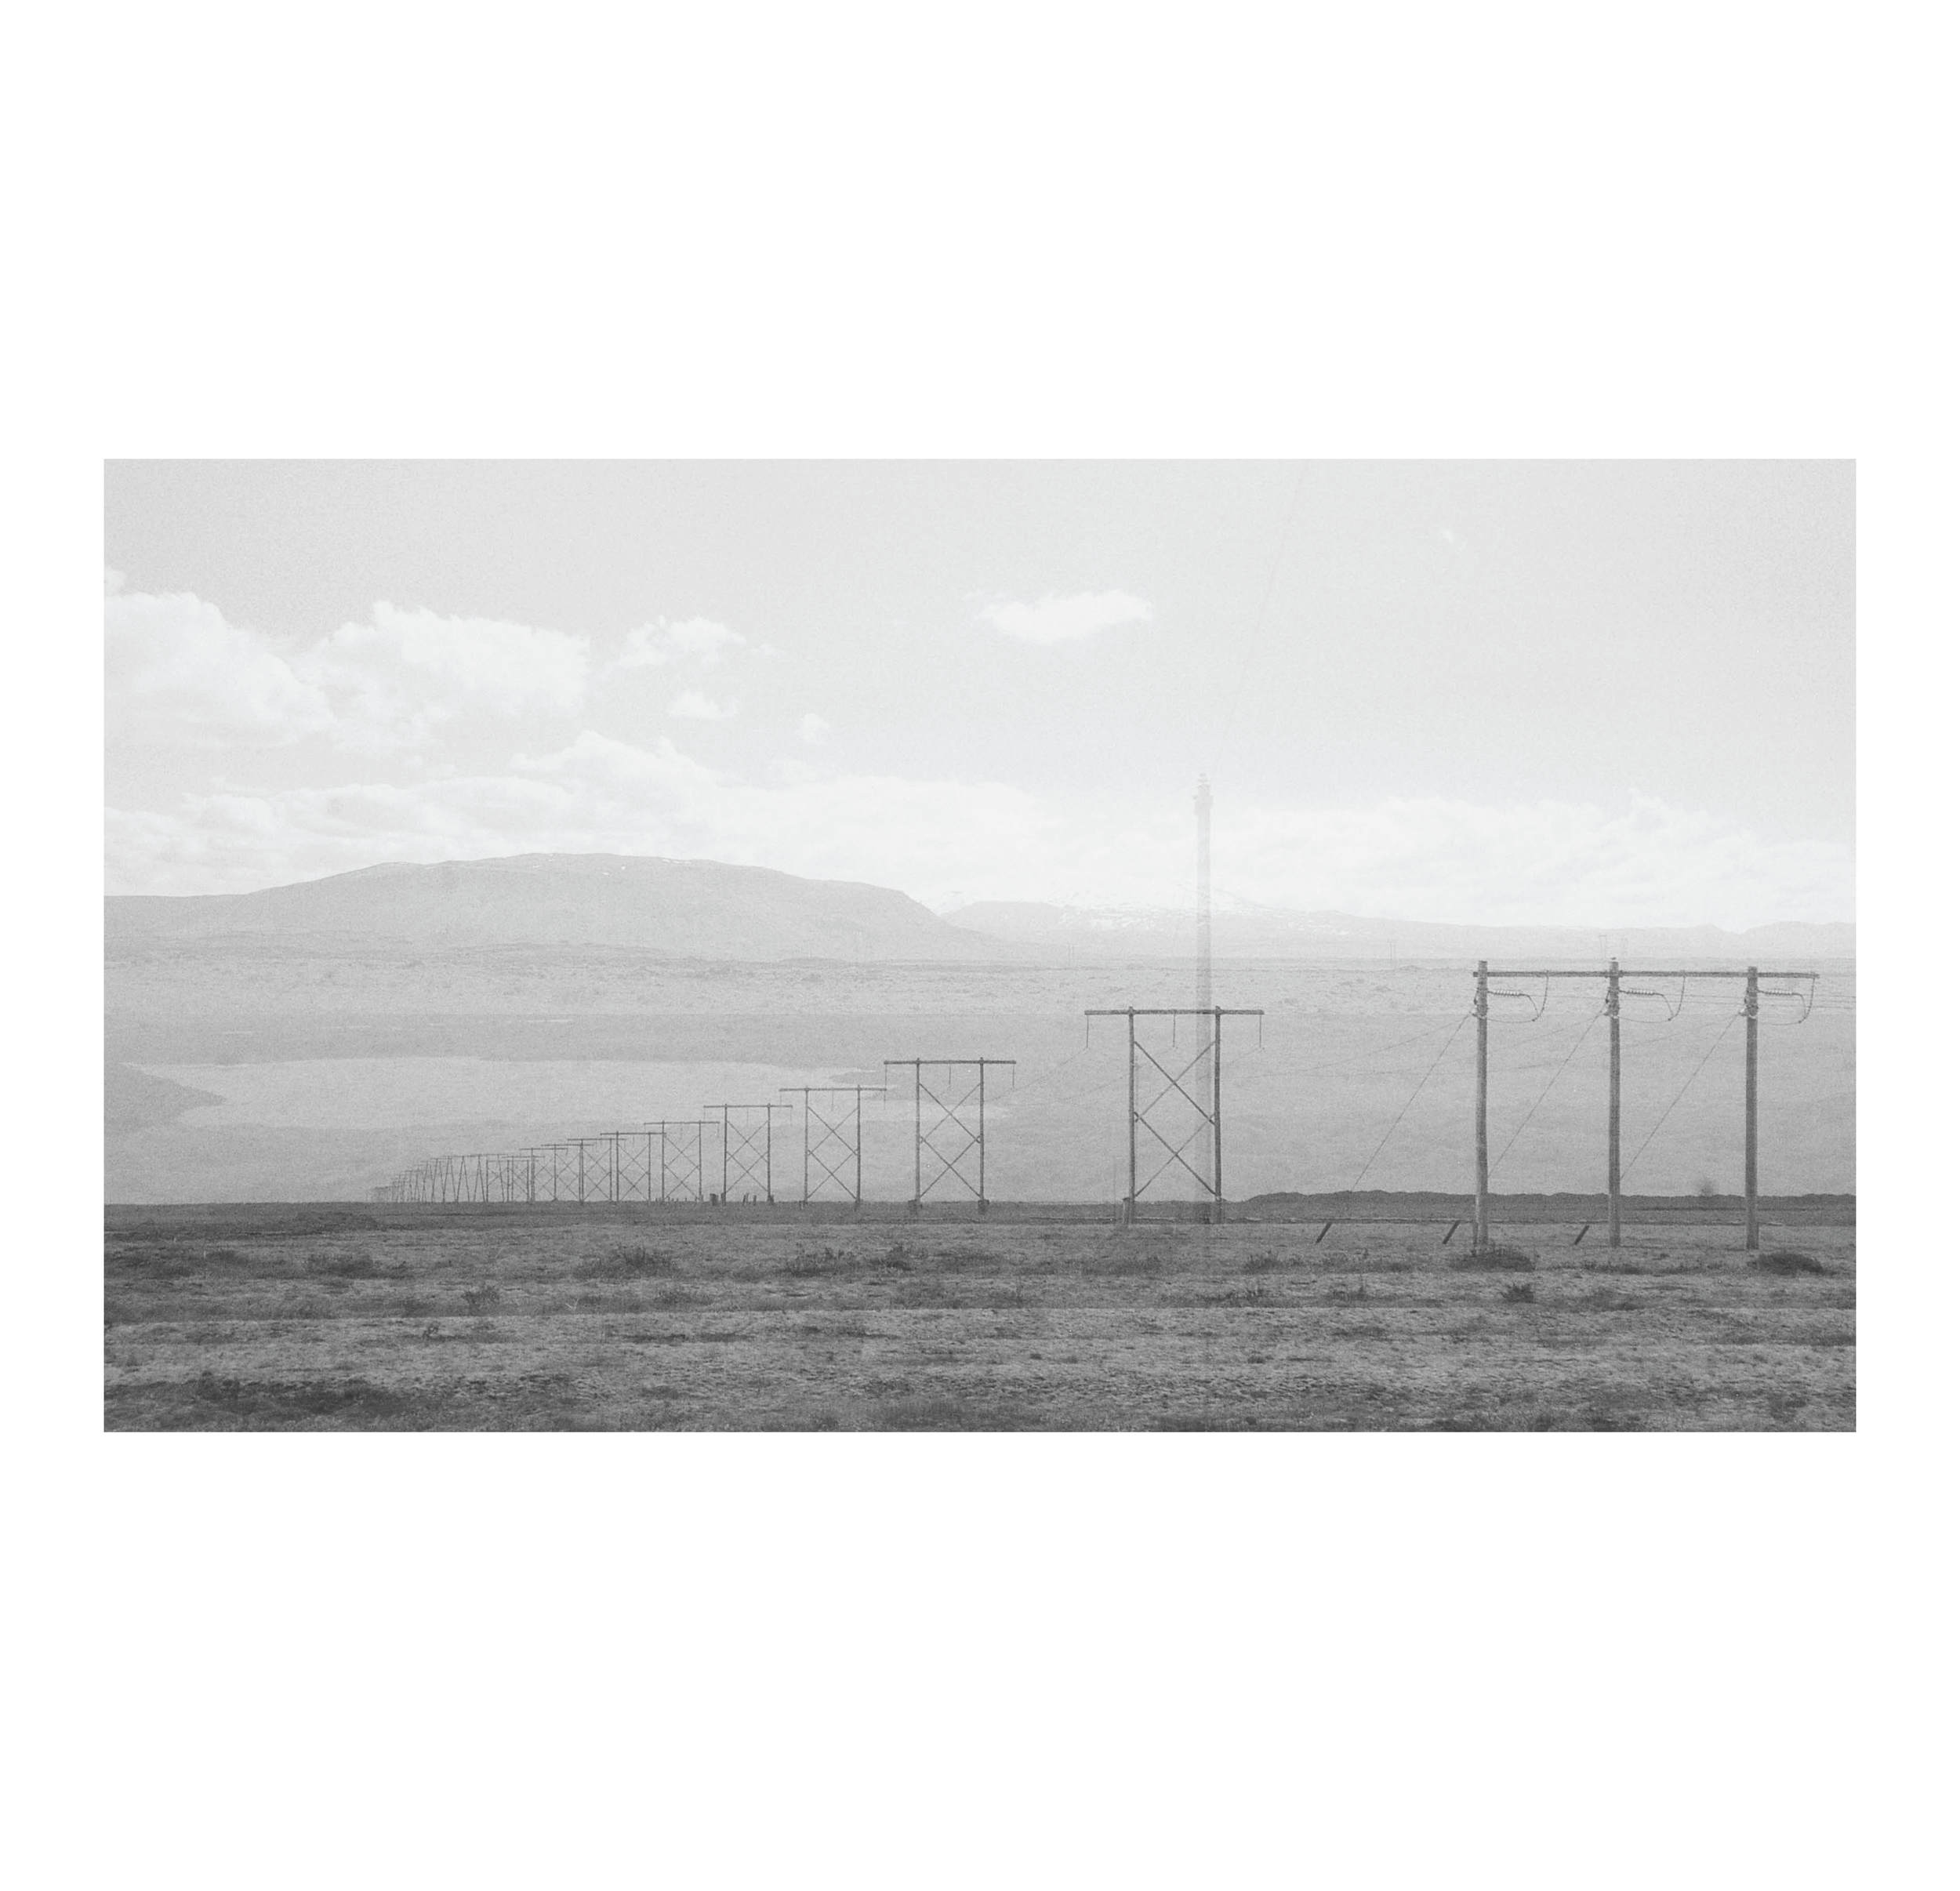 Pylon Collage by Johan Oskar Rasmussen